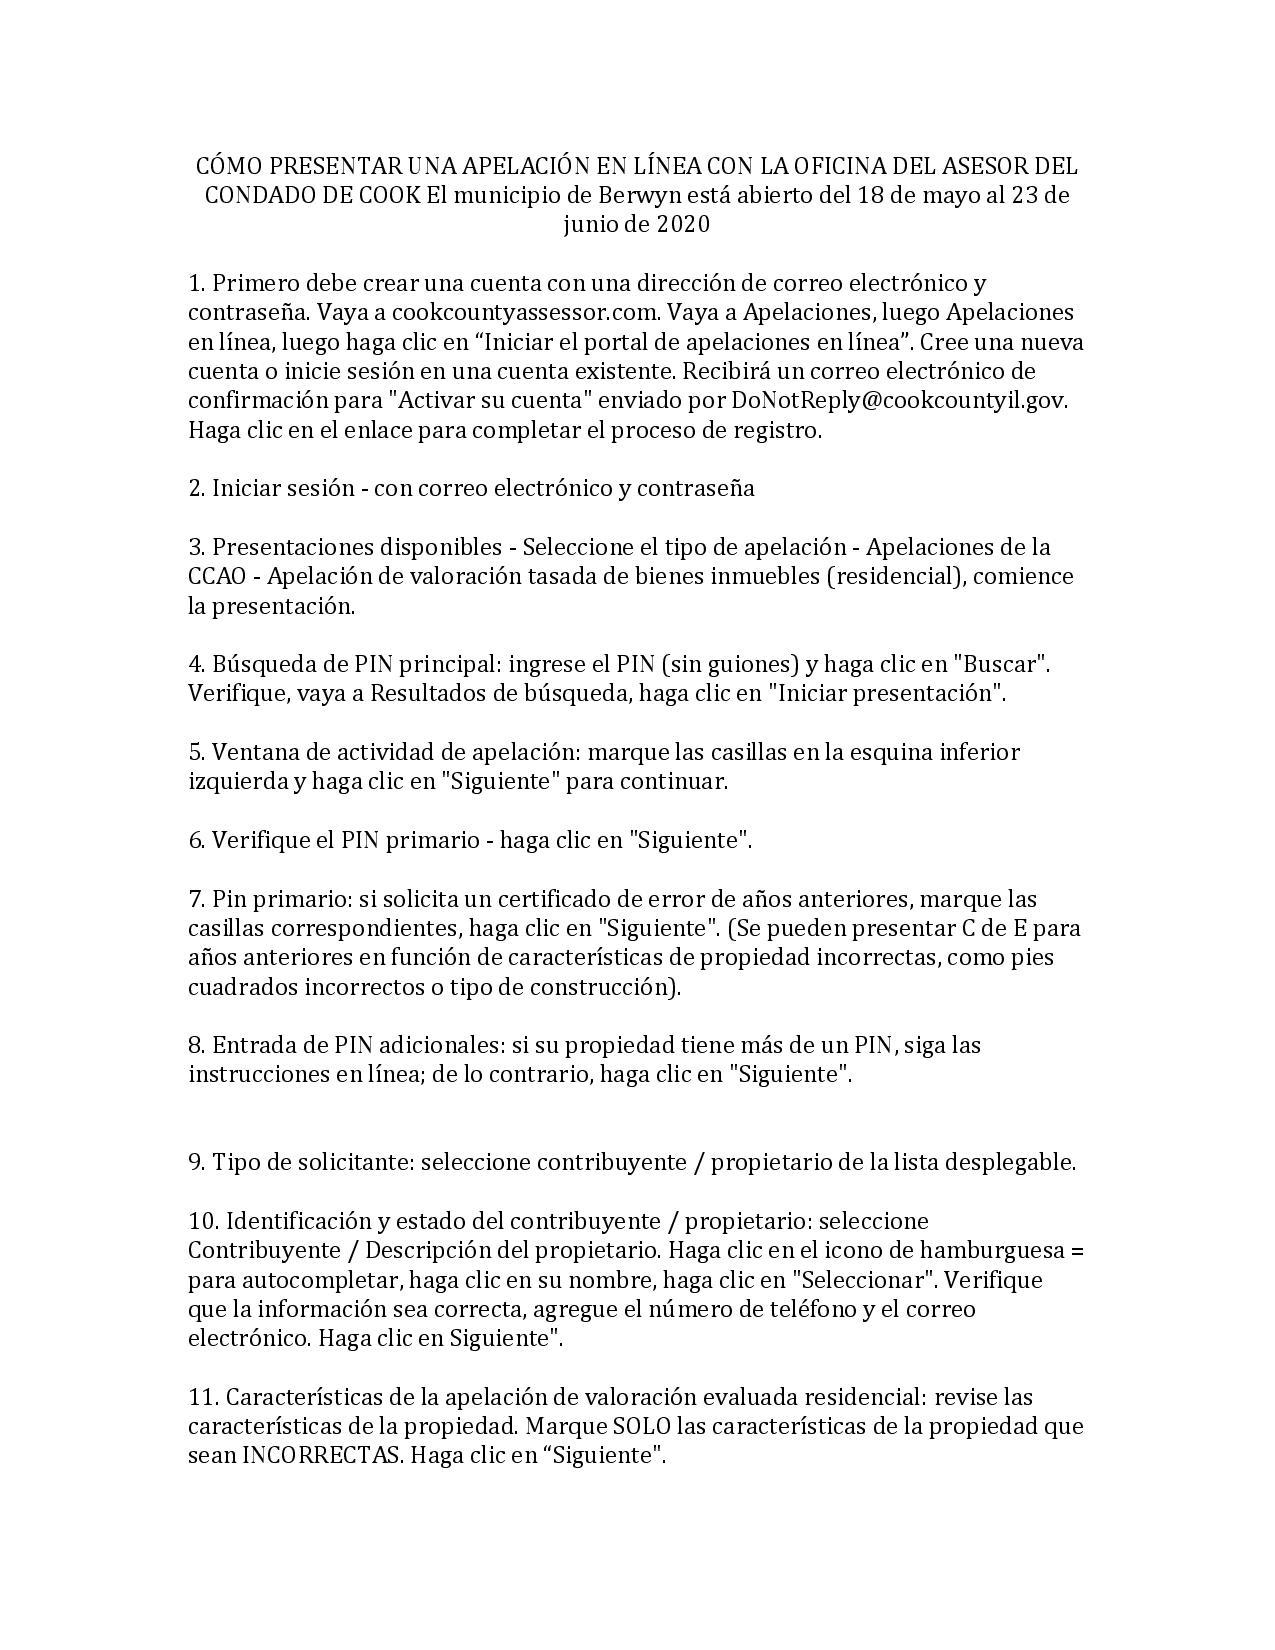 STEP_BY_STEP_spanish-page-001.jpg